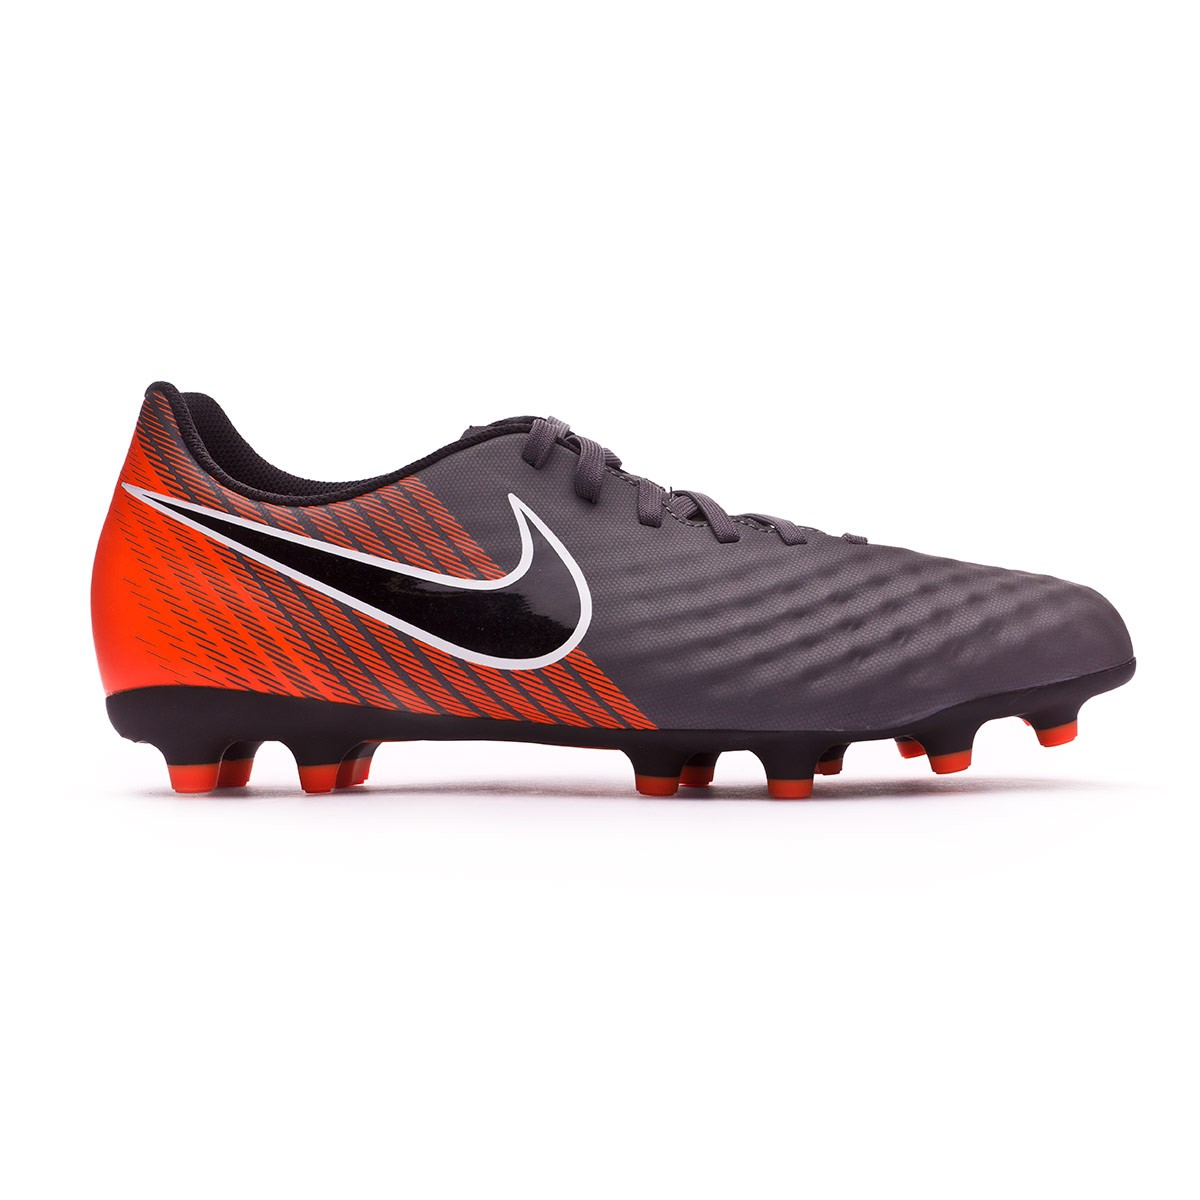 b1d3a6c568 ... Bota Magista Obra II Club FG Dark grey-Black-Total orange-White.  CATEGORIA. Chuteiras de futebol · Nike